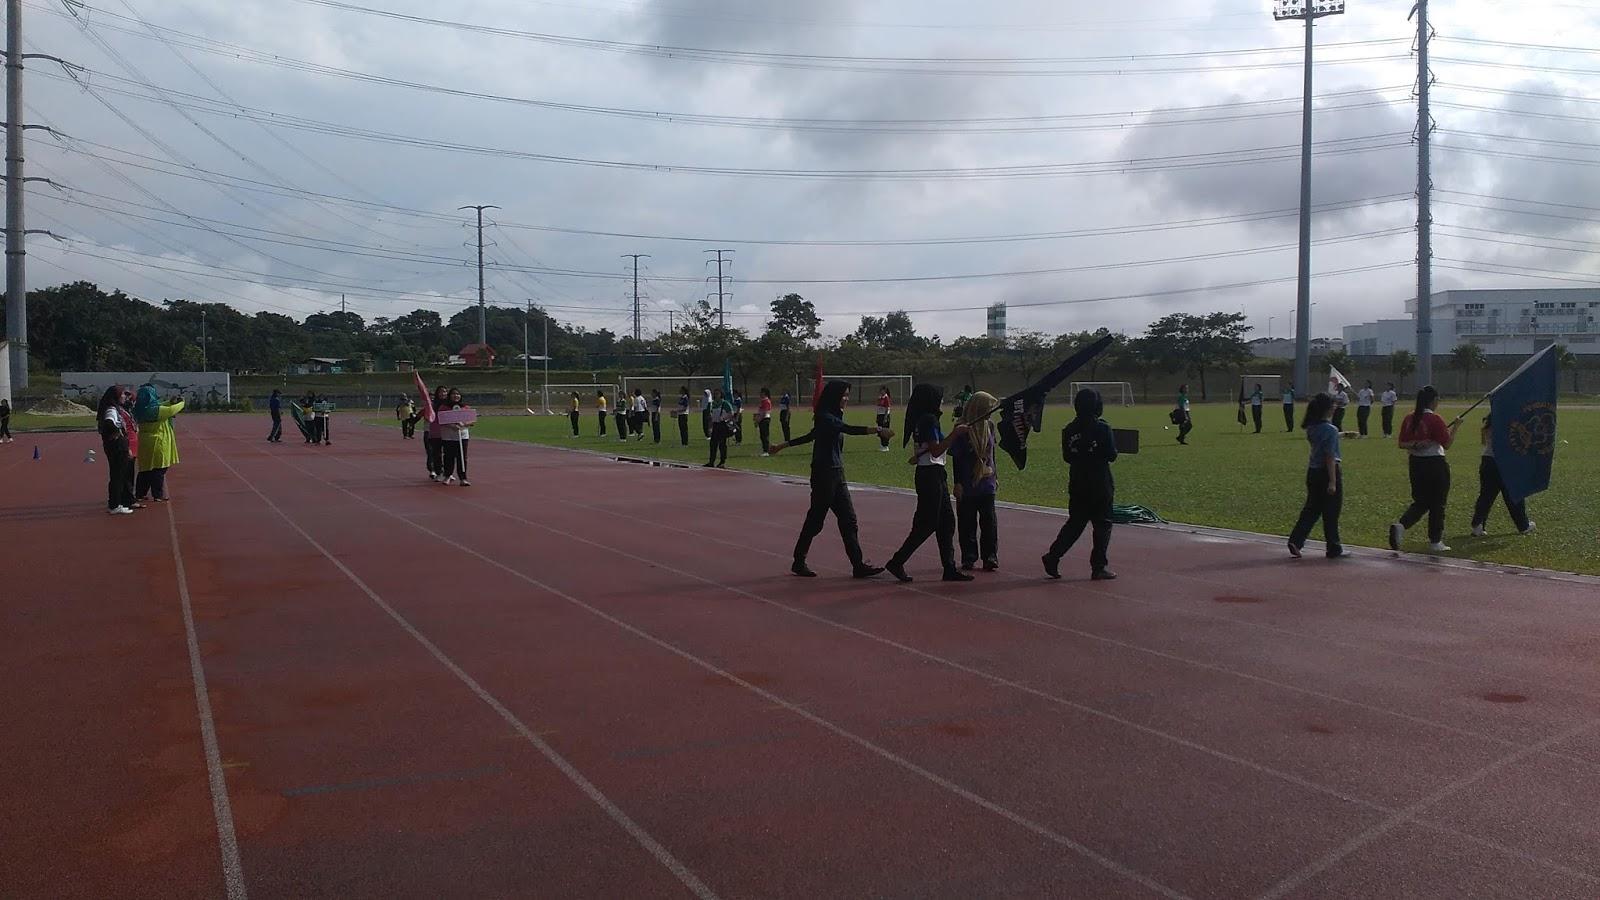 essay 1 student 1 sport 1 malaysia day